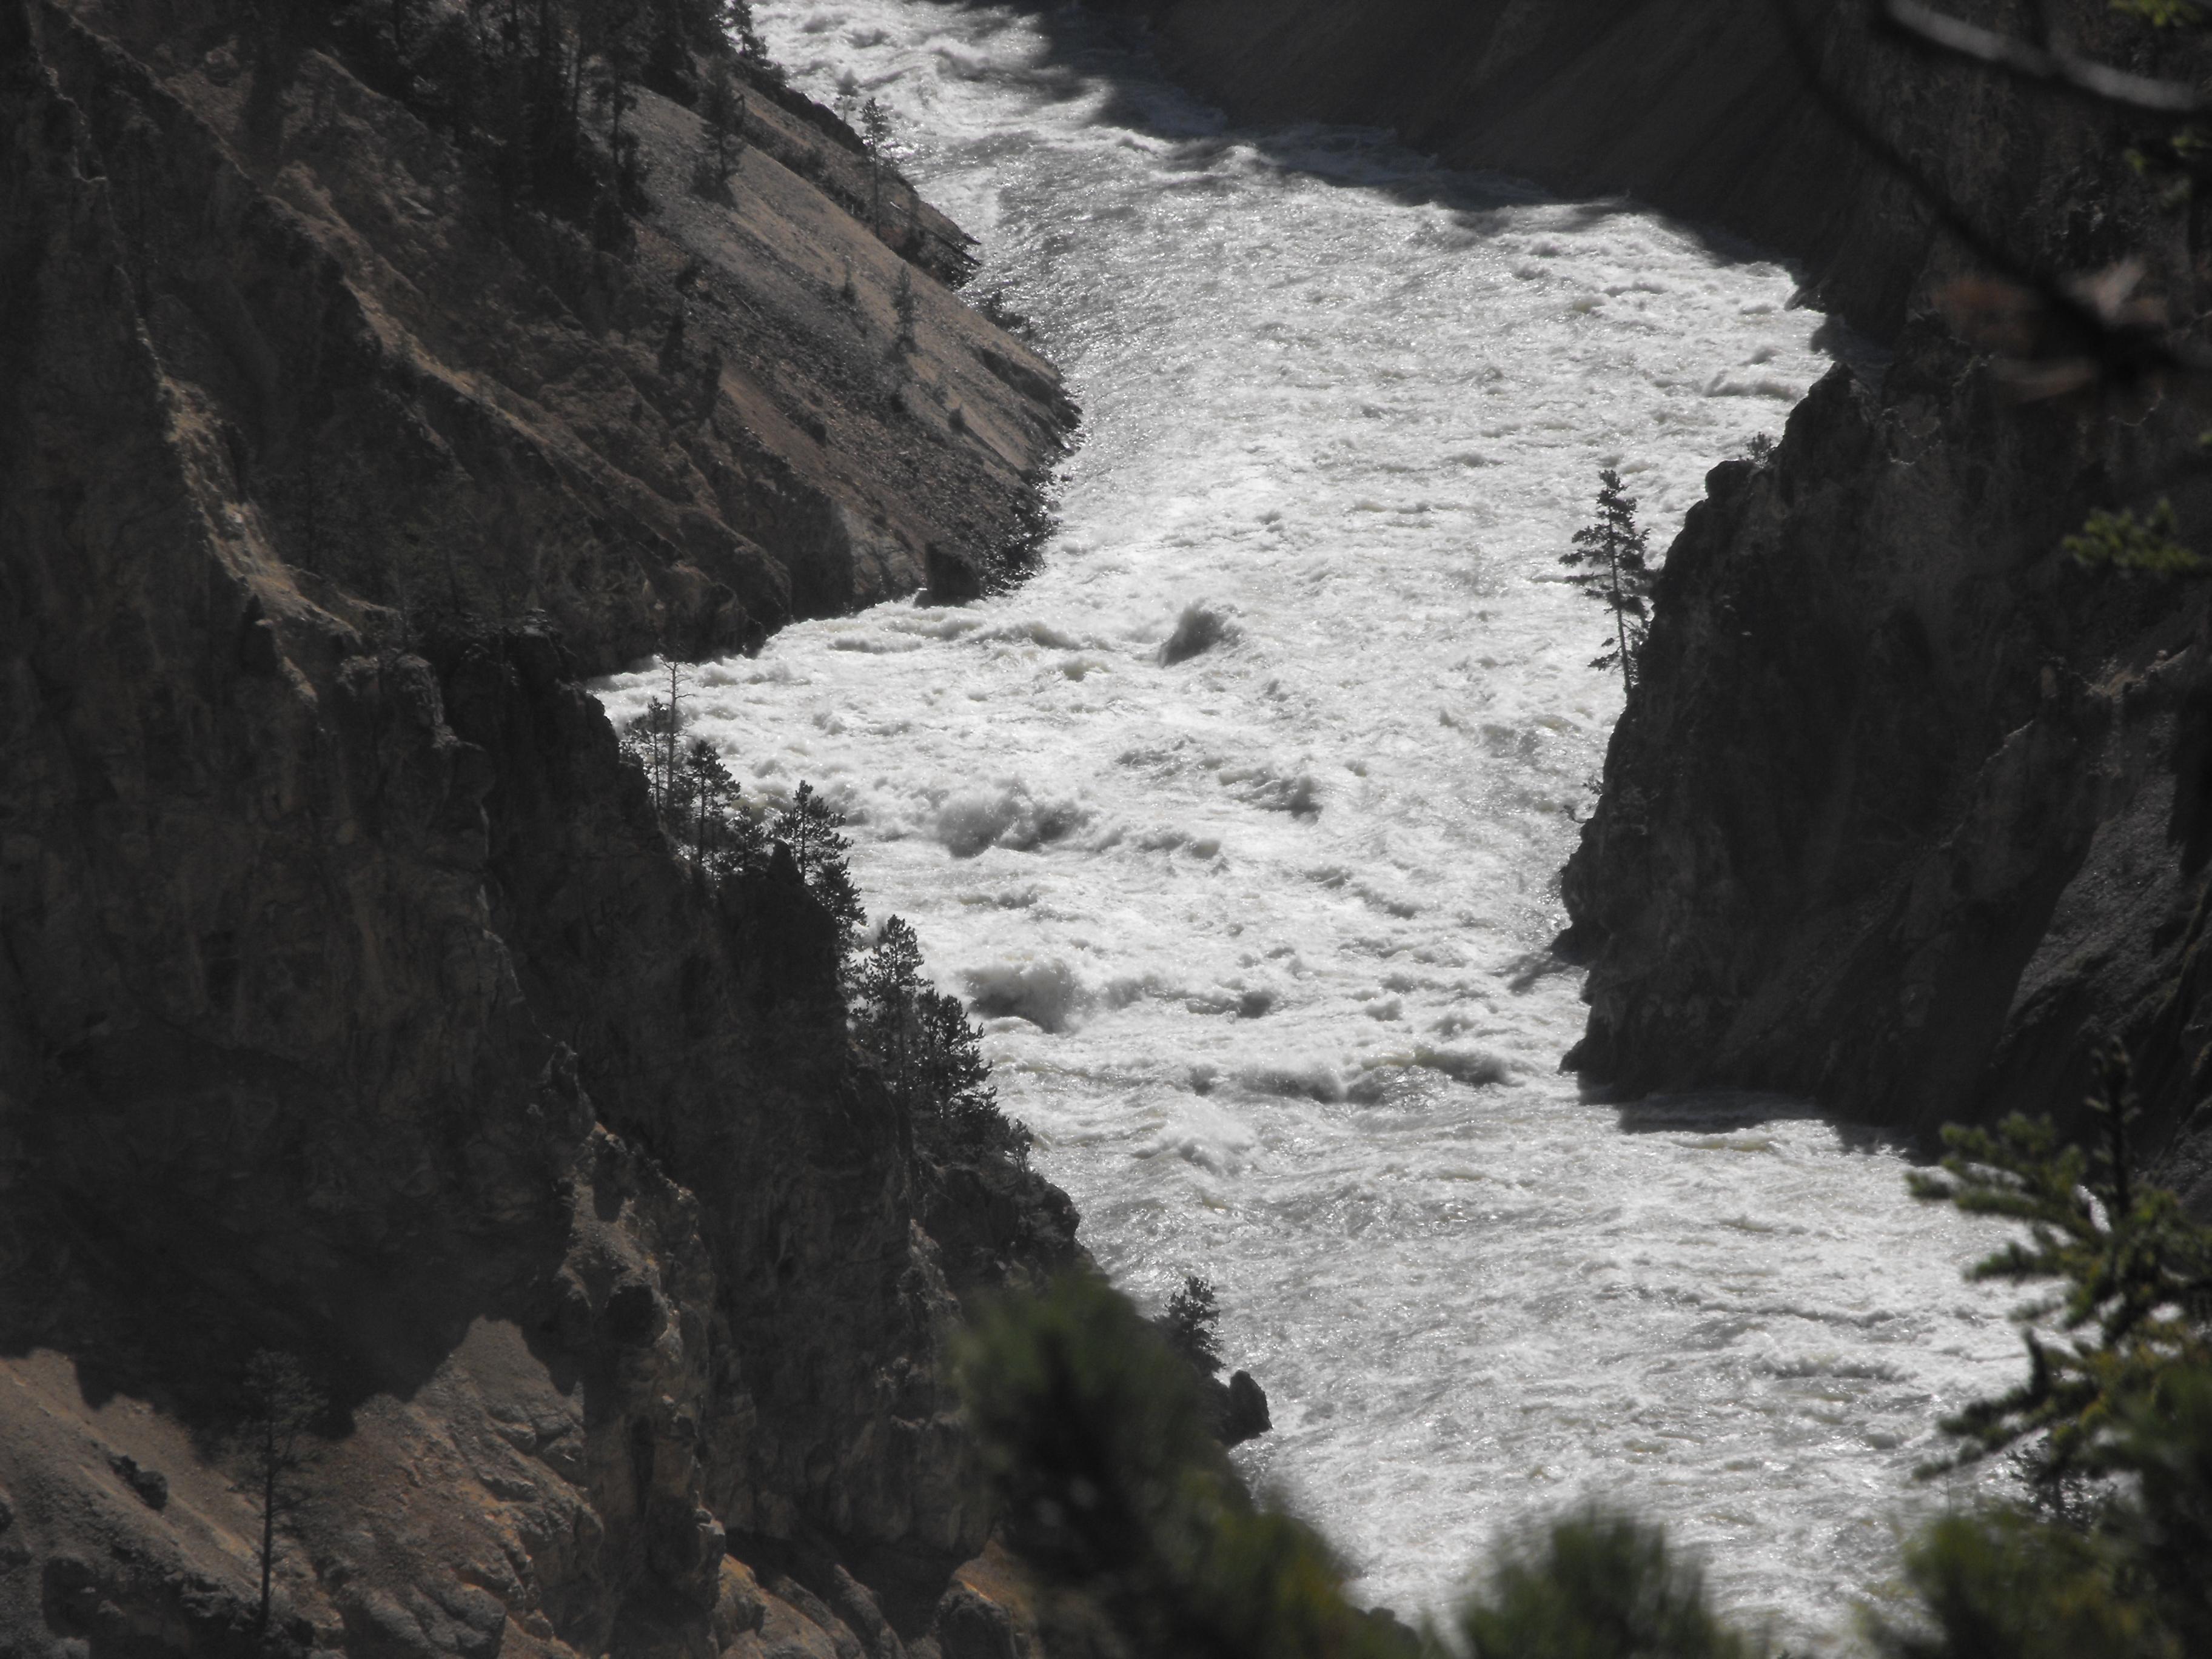 yellowstone, yellowstone national park, falls, waterfall, wyoming